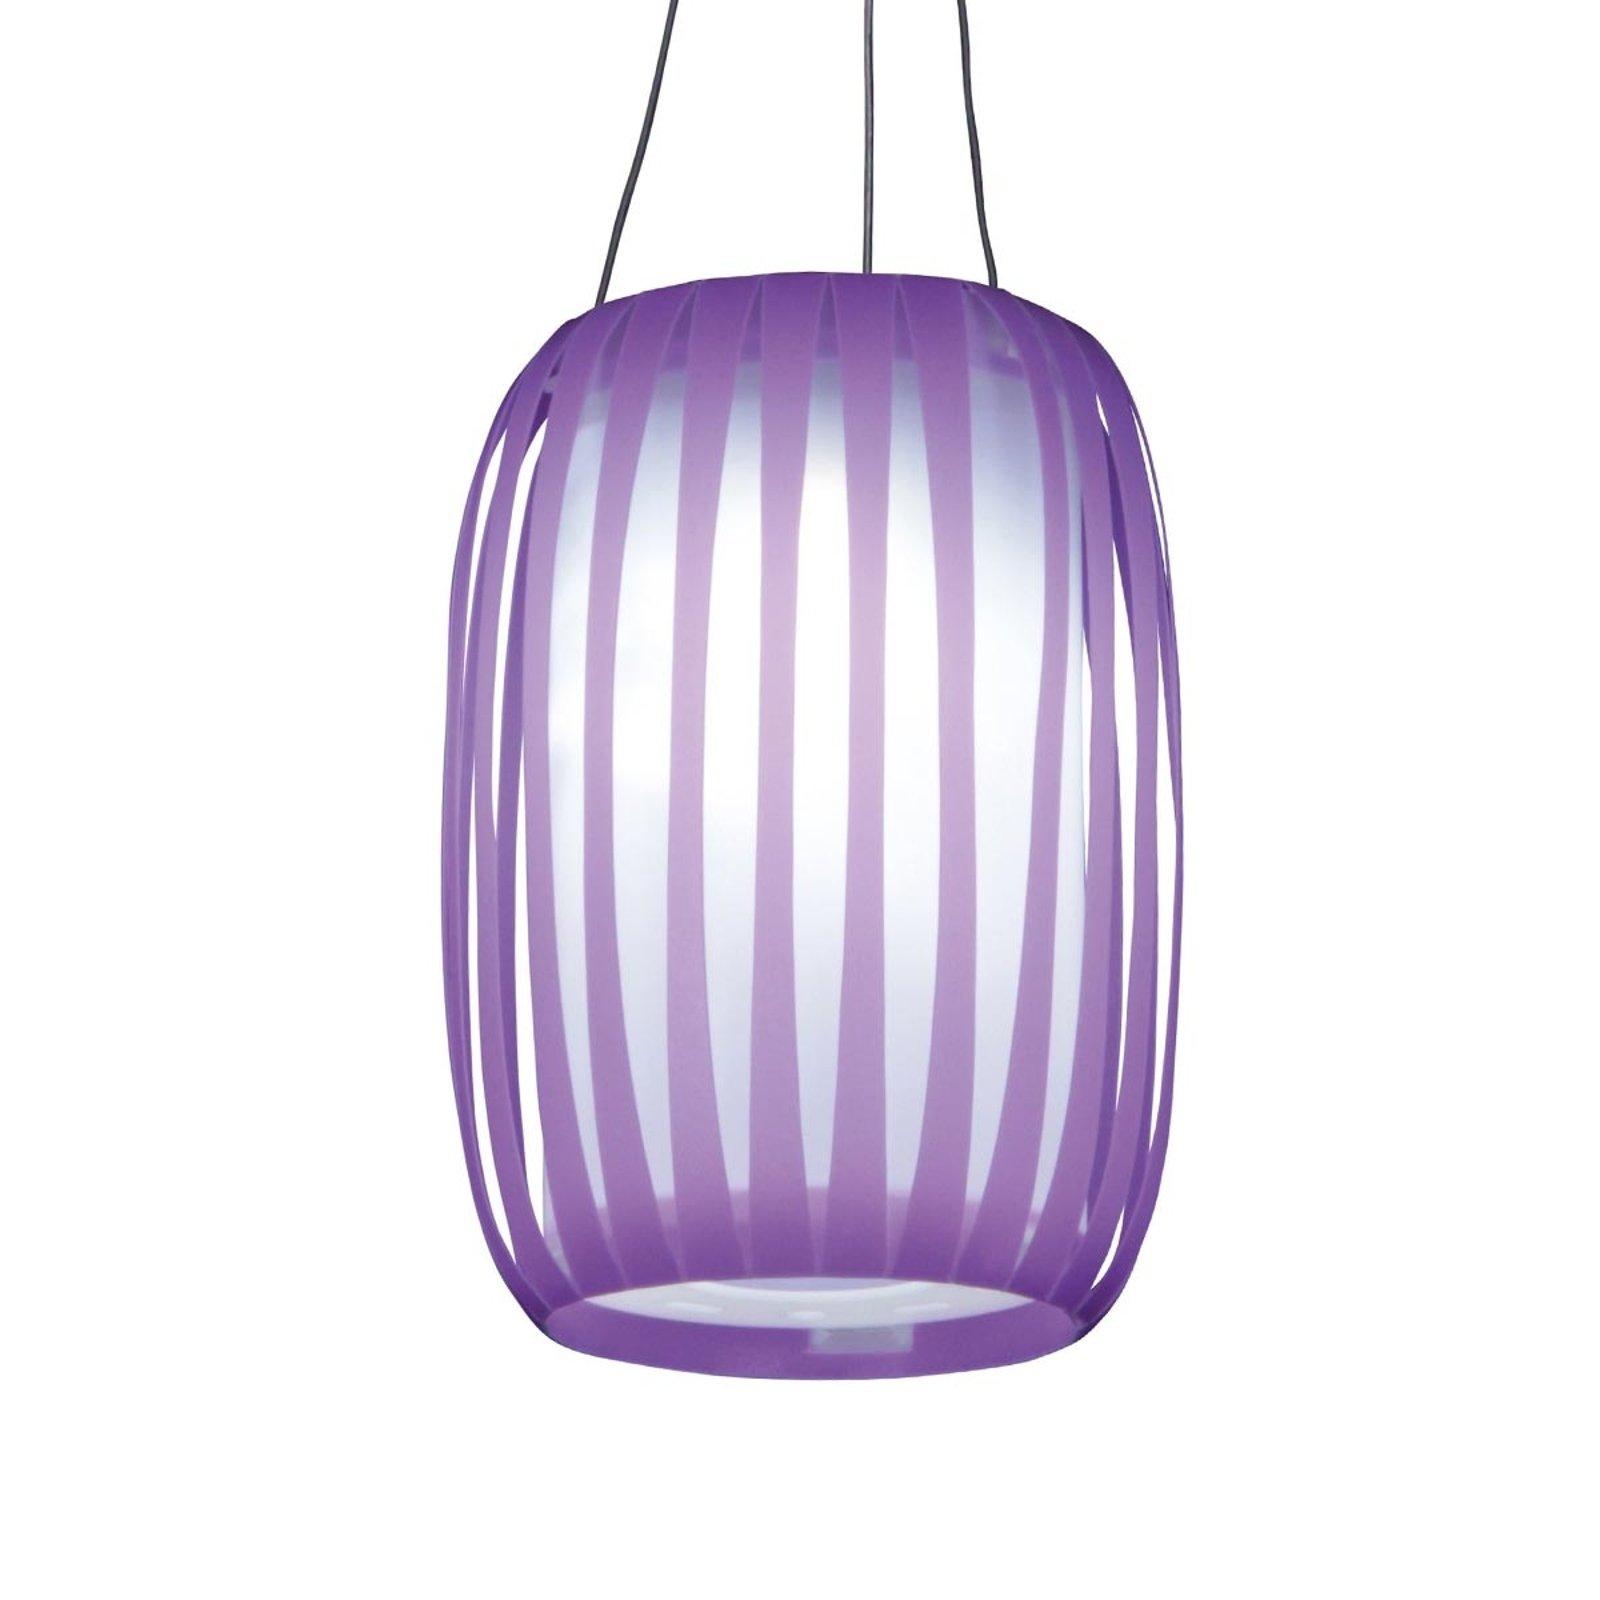 LED solcellelampen Lilja, lilla i lyktform